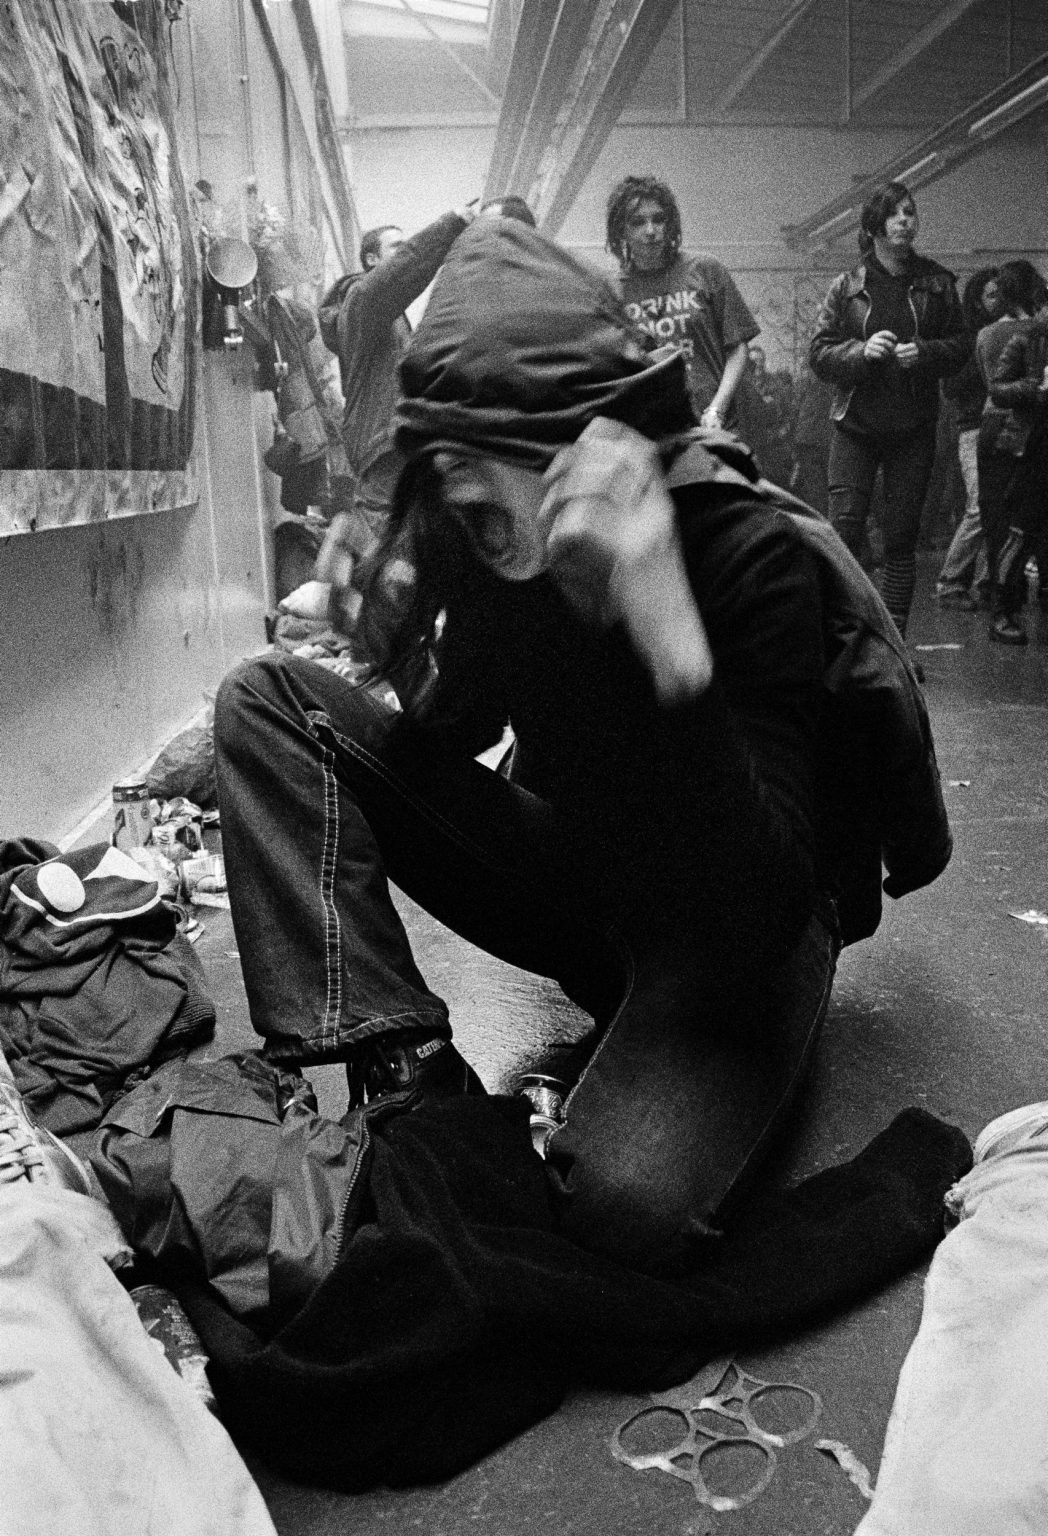 London, 2003 - R. having fun at a squat party in Shoreditch. >< Londra, 2003 - R. si diverte ad uno squat party a Shoreditch.